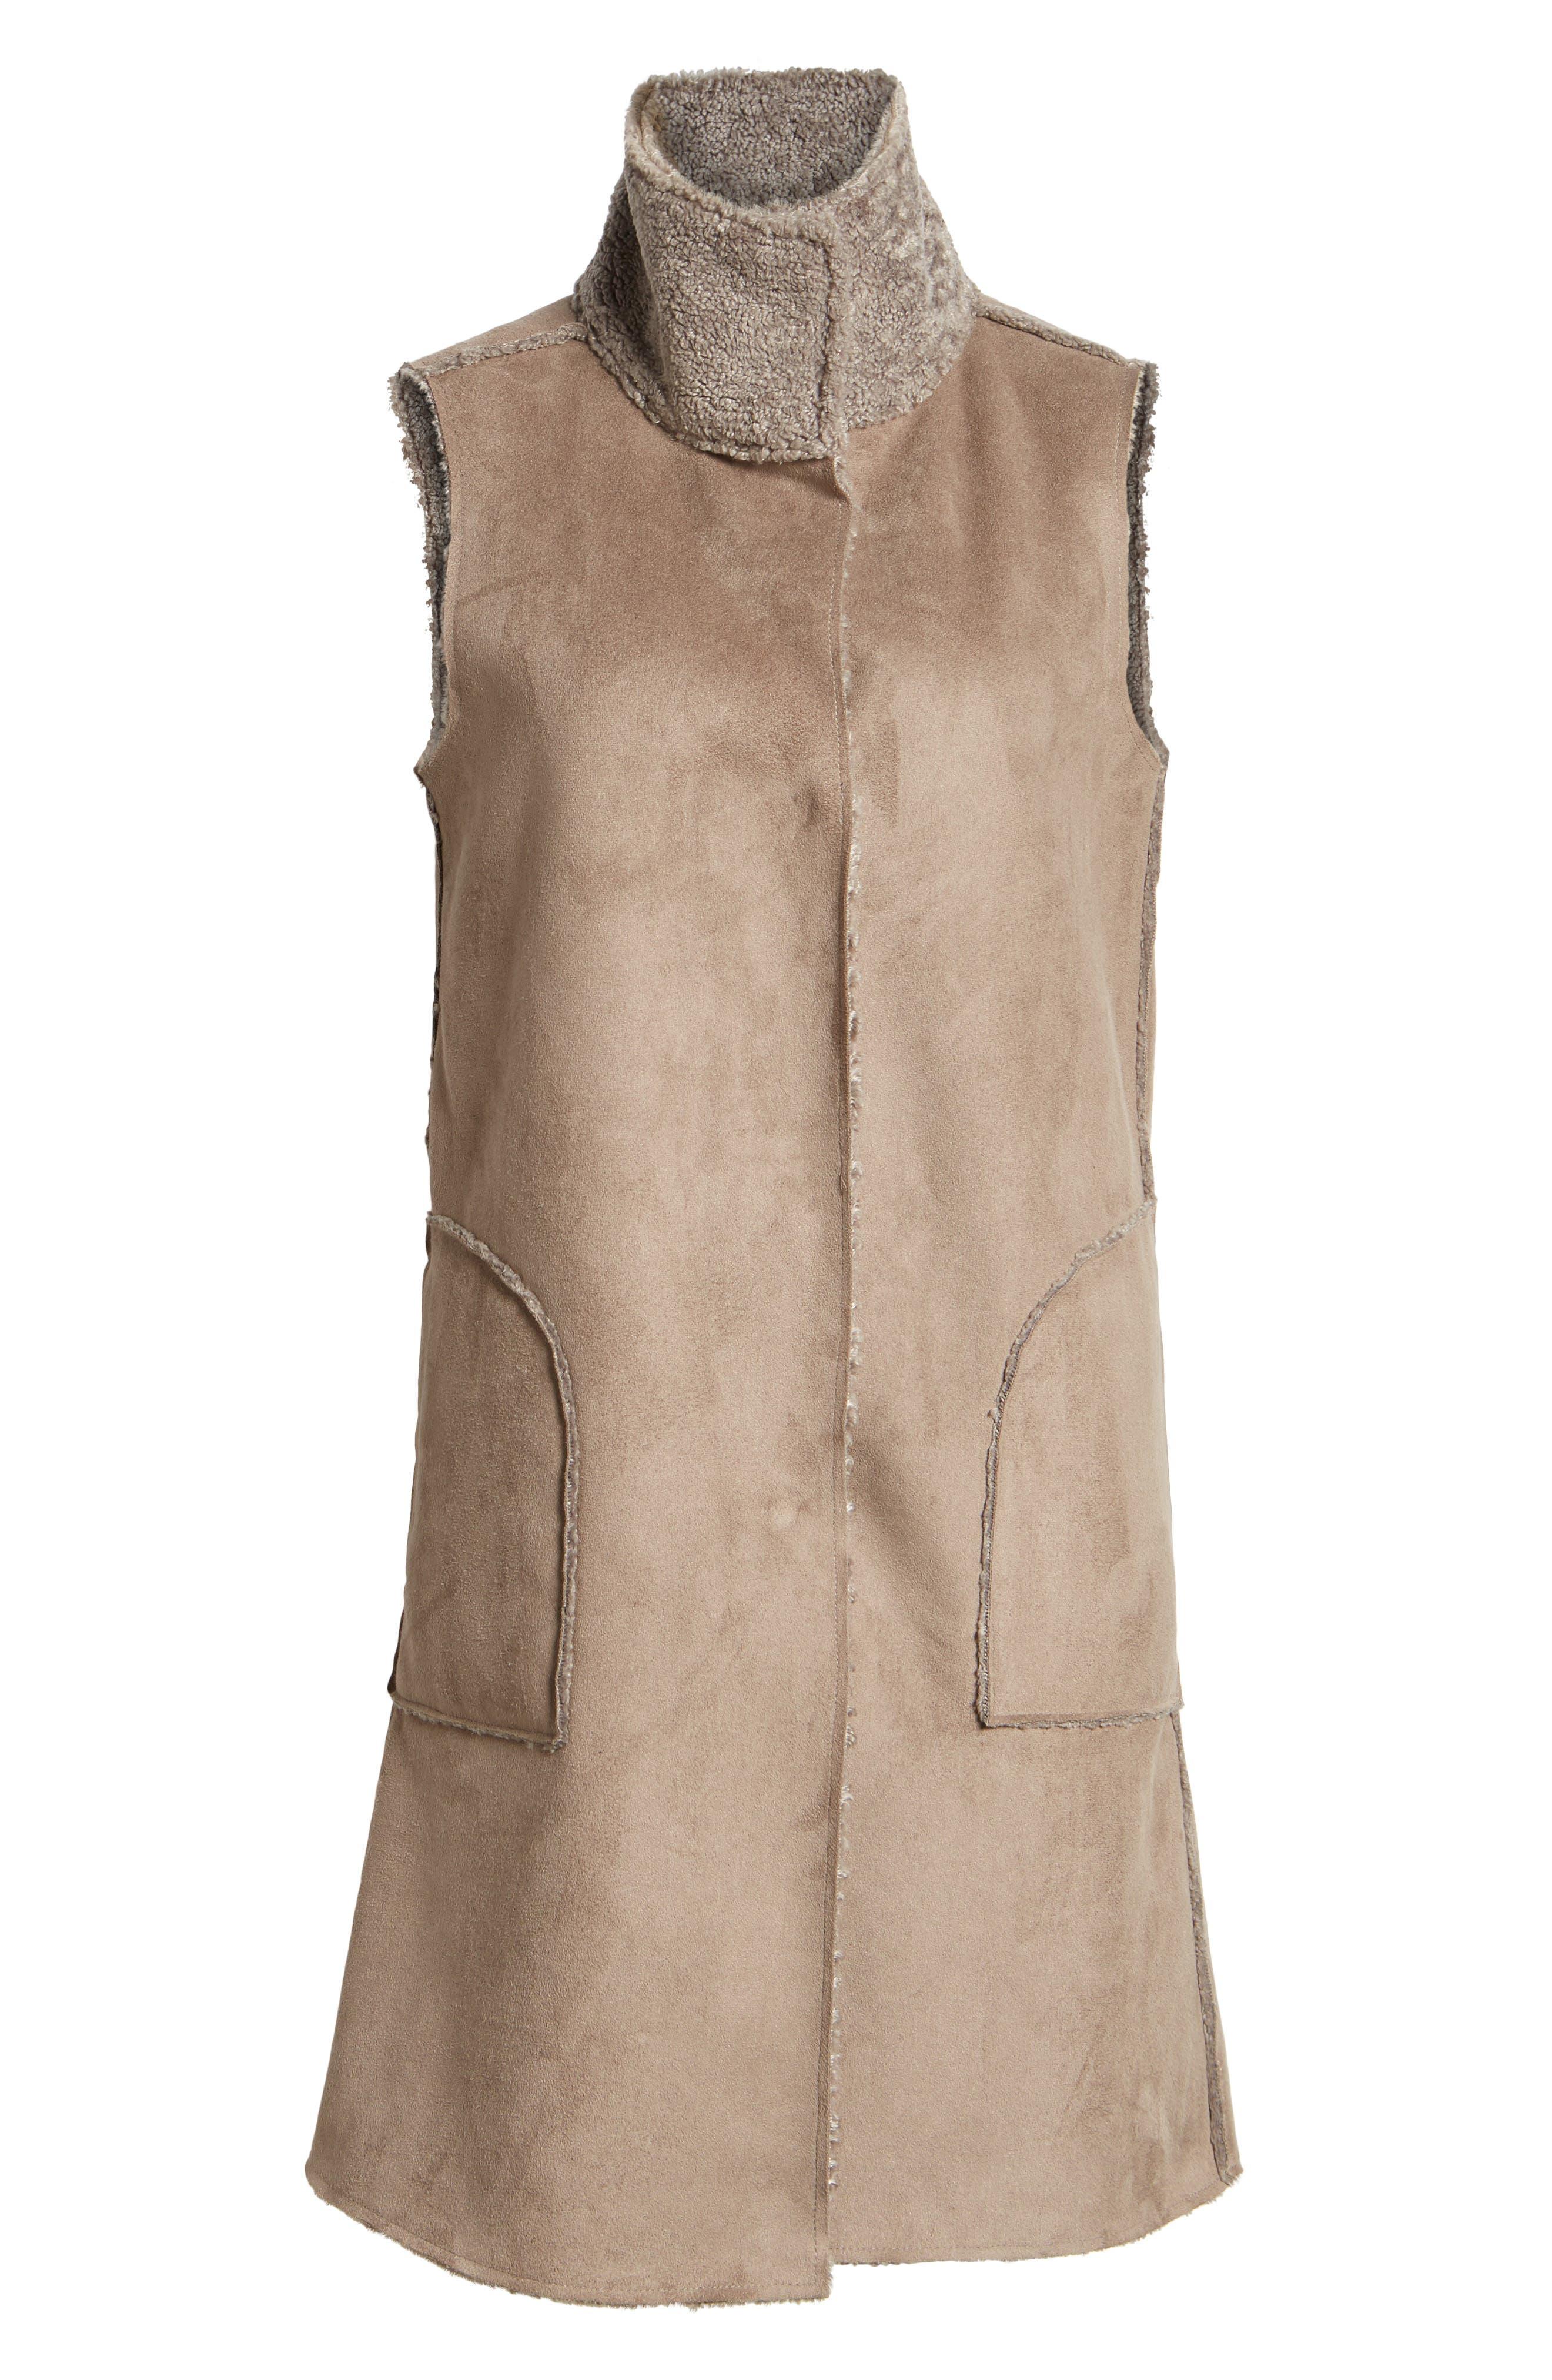 Velvet Reversible Faux Shearling Vest,                             Alternate thumbnail 6, color,                             Brown/ Brown